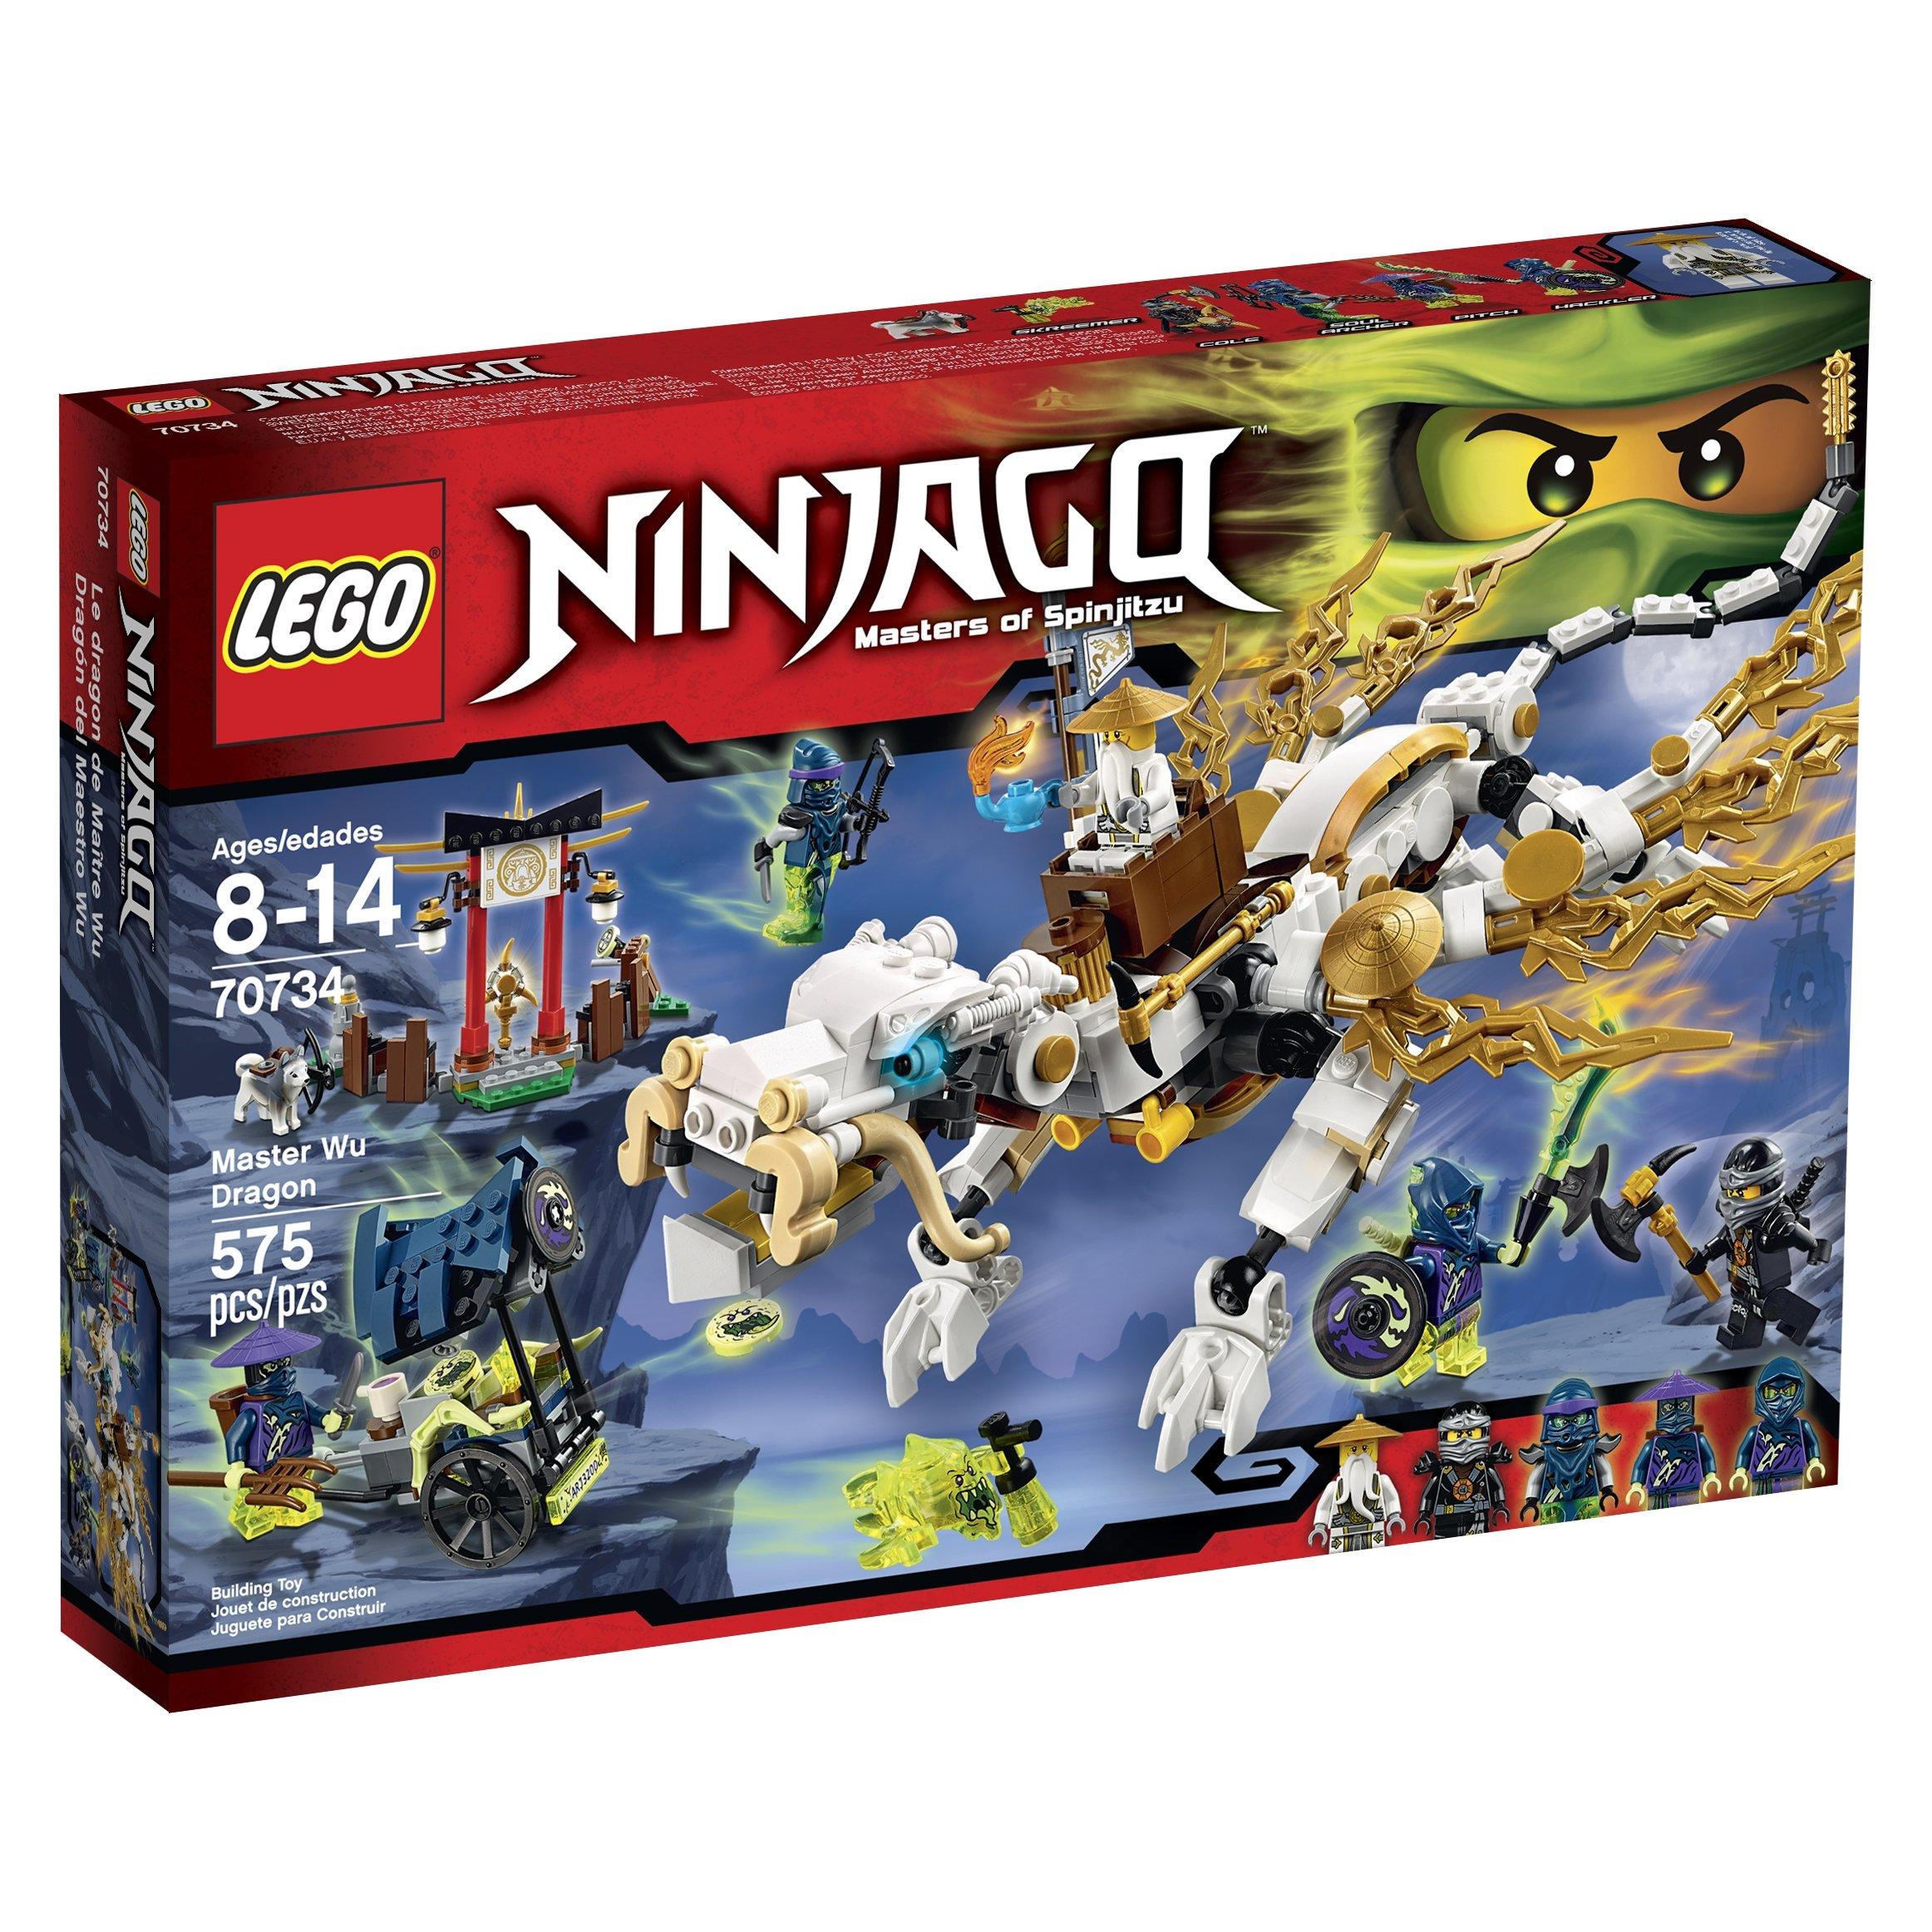 Lego Ninjago 70734 Master Wu Dragon Tiendamiacom